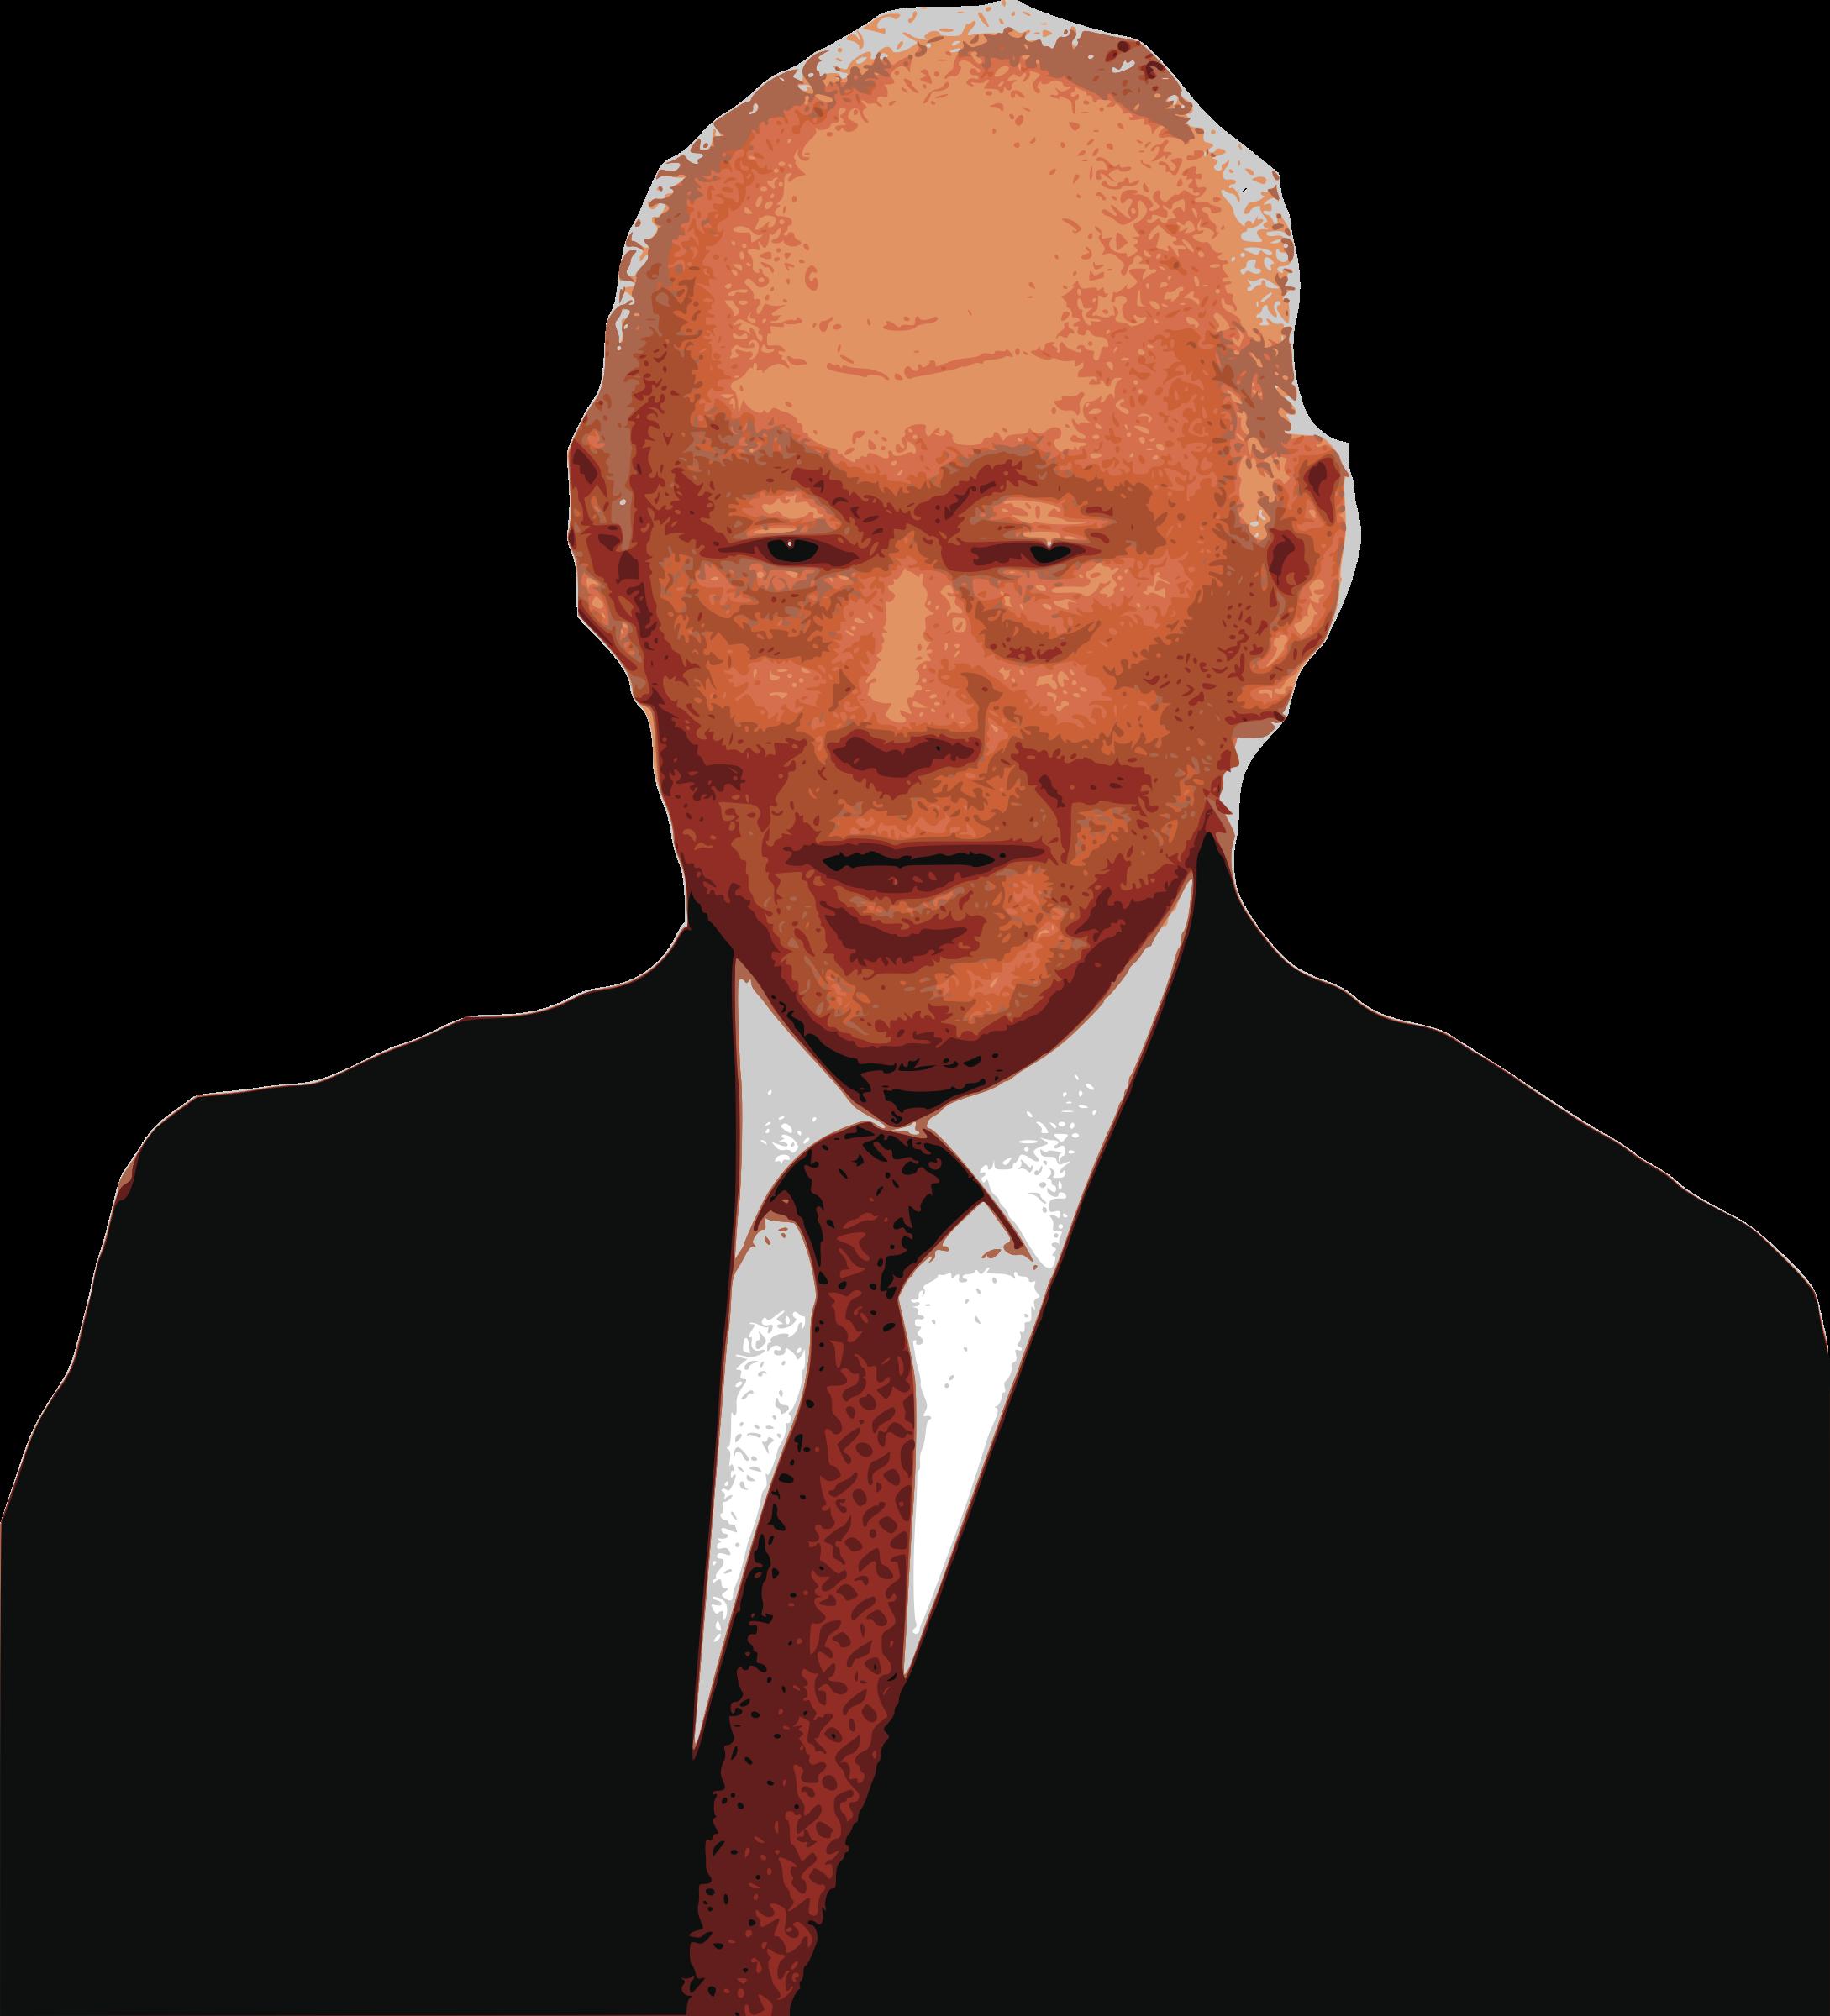 Lee kuan yew big. Politics clipart prime minister